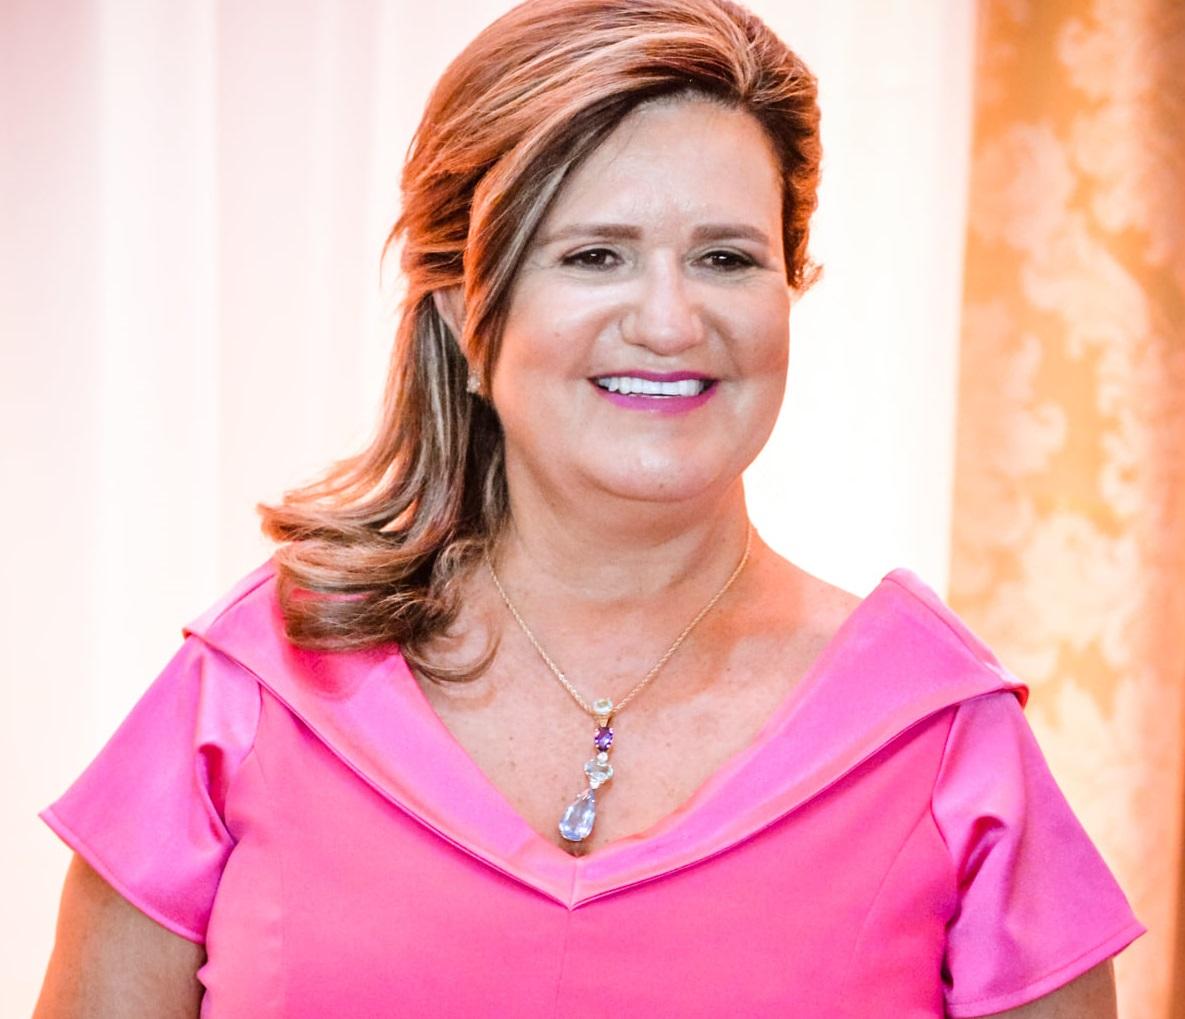 Prefeita de Soledade Marilda Corbelini é eleita primeira mulher presidente da AMASBI